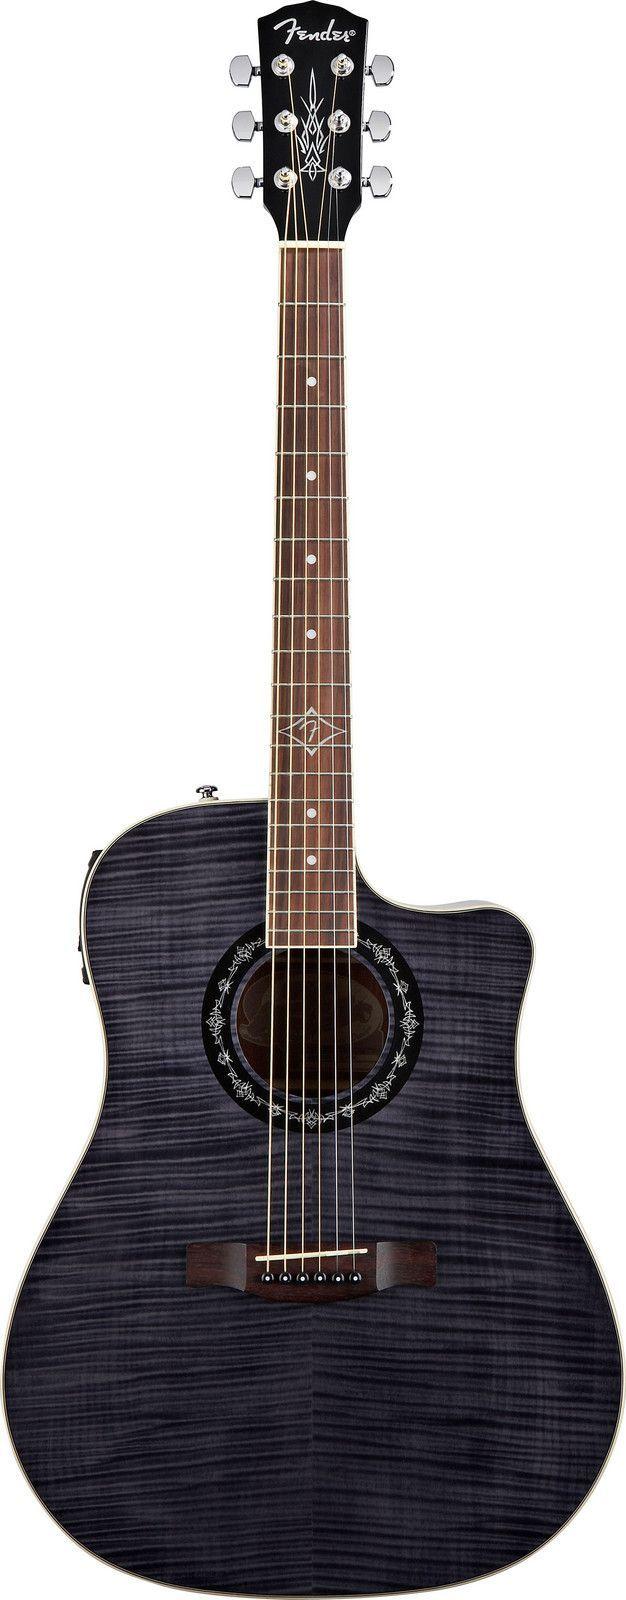 fender t bucket 300 ce black beautiful acoustic guitars fender acoustic guitar guitar. Black Bedroom Furniture Sets. Home Design Ideas